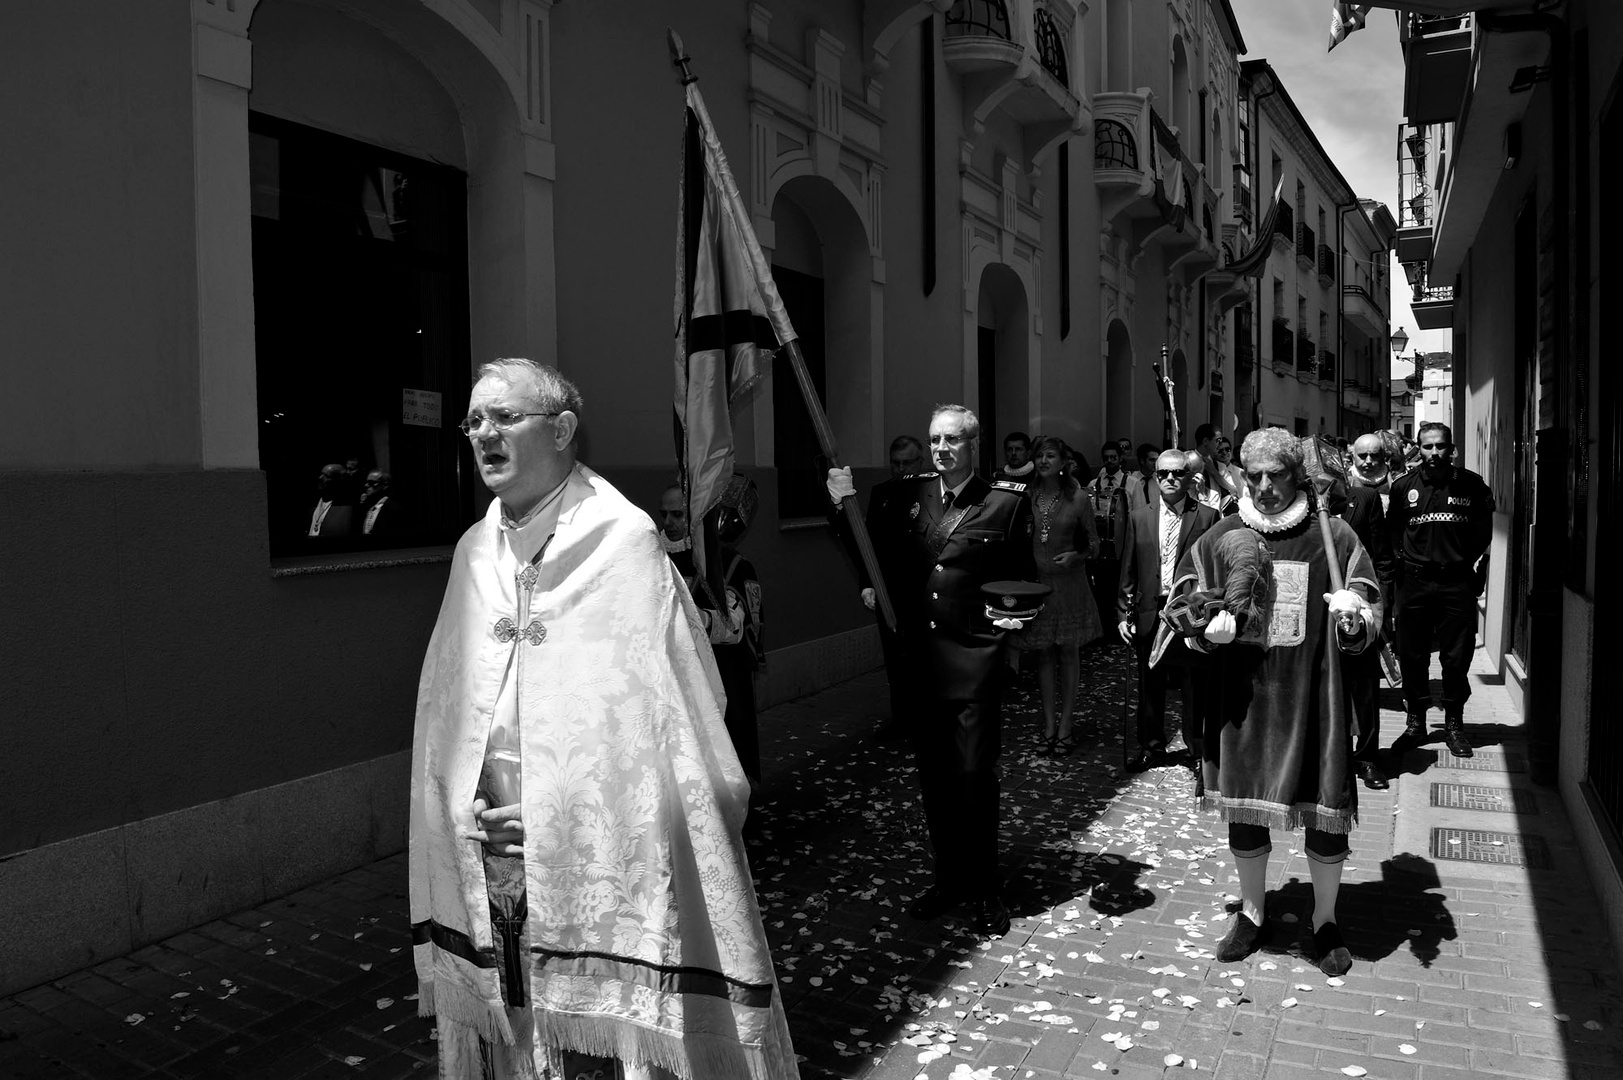 Procession de la fête-Dieu à Ponferrada, Bierzo